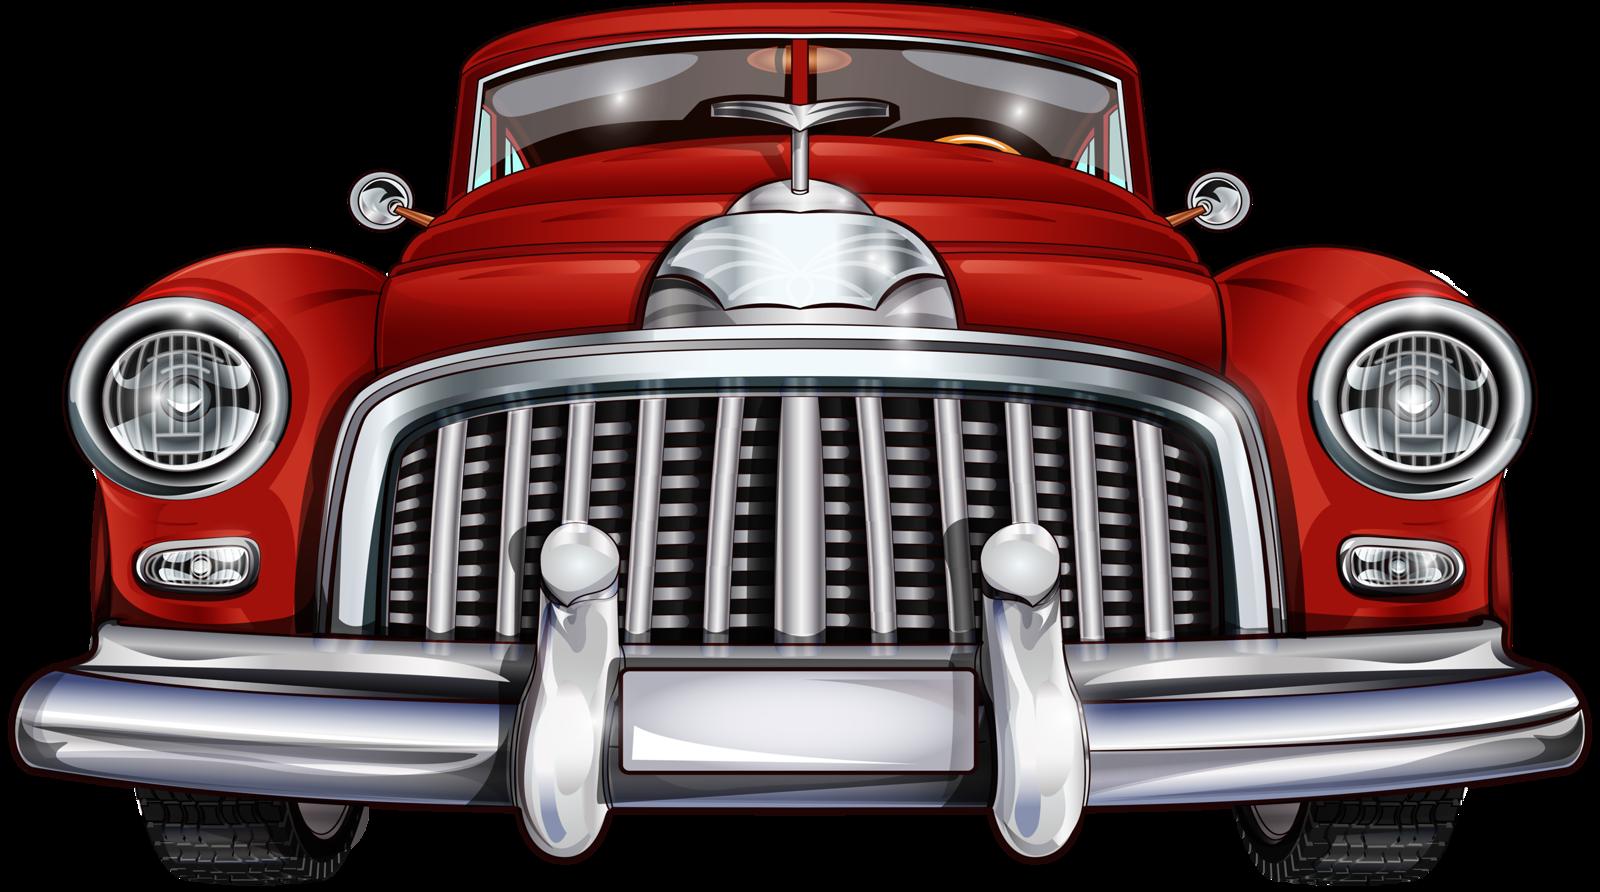 Antique car show clipart clip art download shutterstock_216055756 [преобразованный].png | Cars, Clip art and ... clip art download